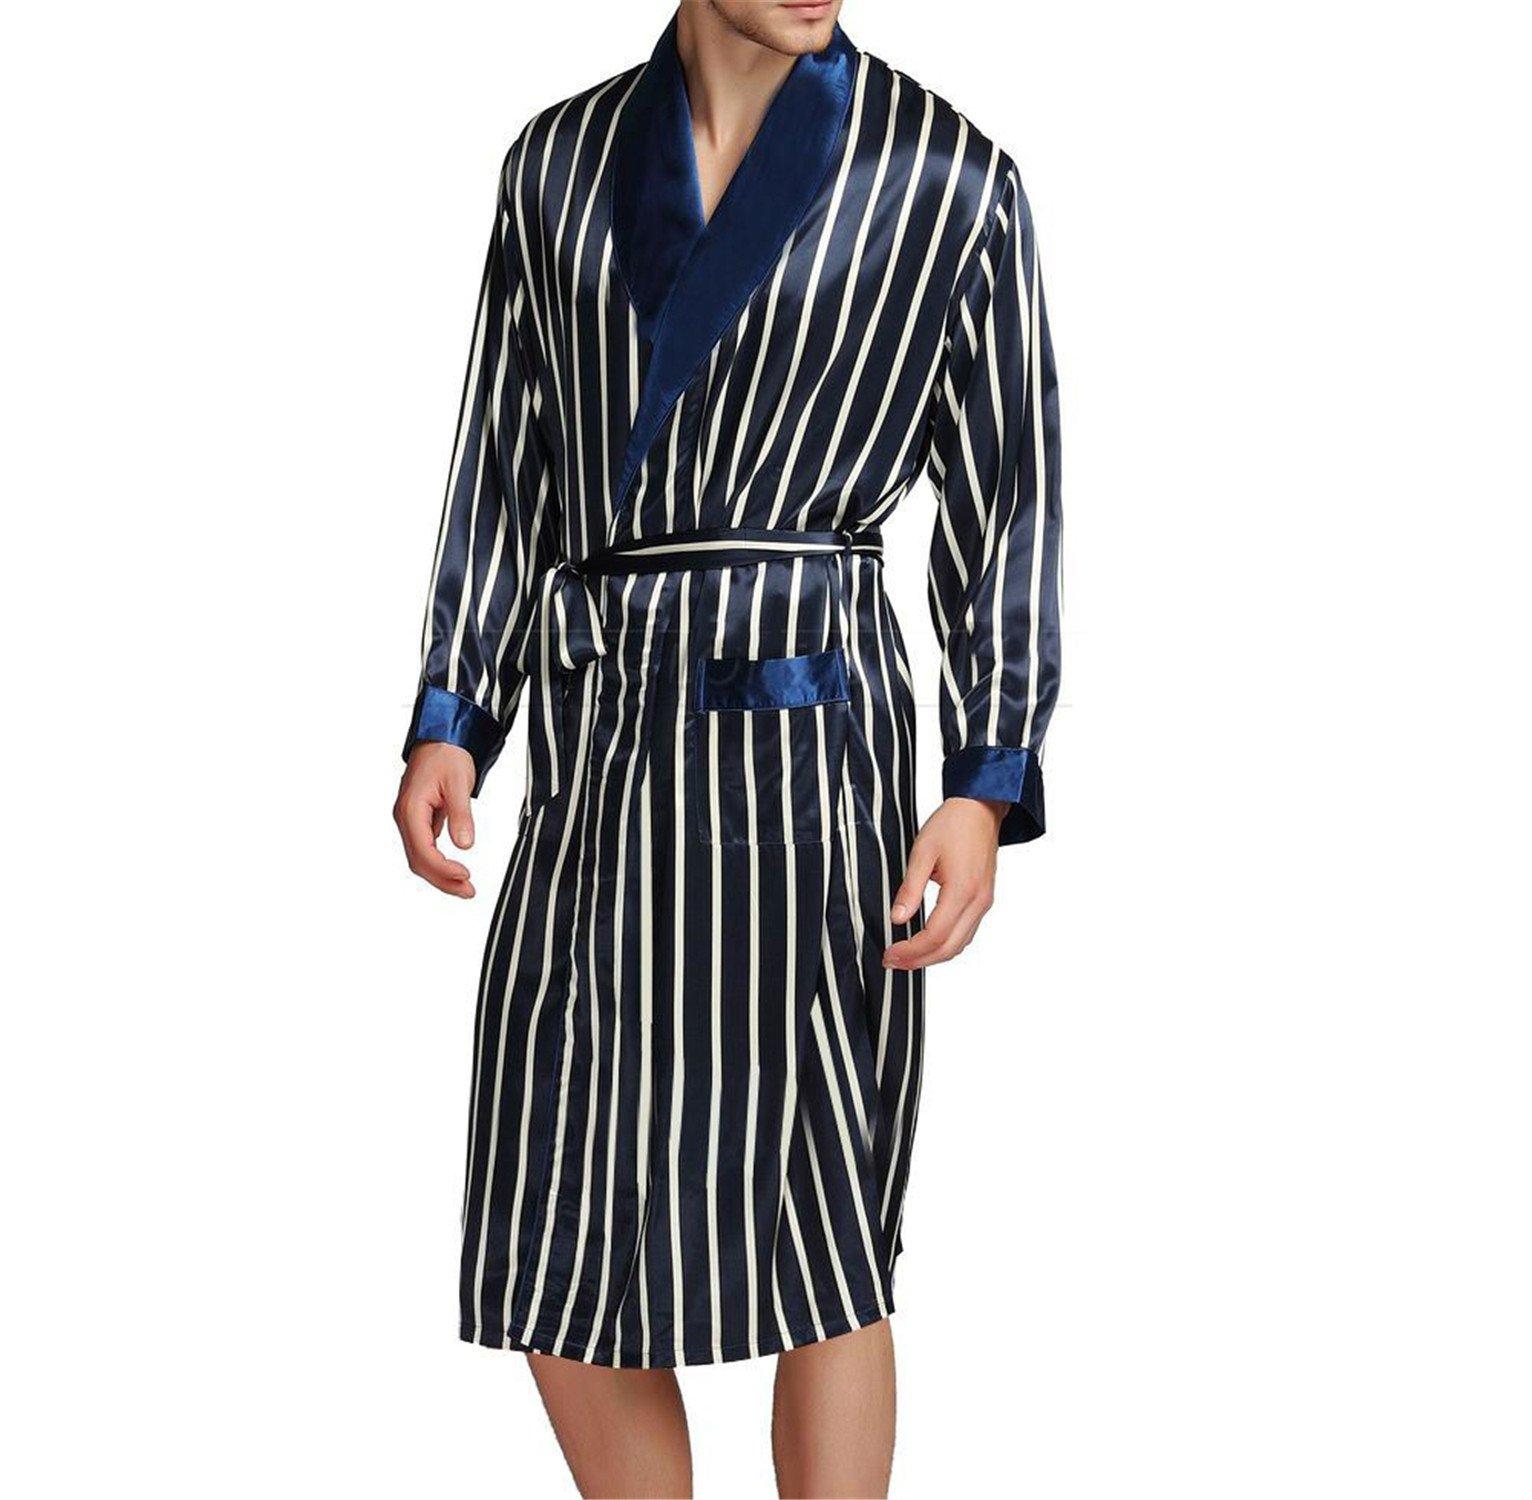 Orcan Bluce Mens Silk Satin Pajamas Sleepwear Robes Nightgown Robes S M L XL 2XL 3XL Plus Beige Blue Striped Navy Blue XXXL by Orcan Bluce